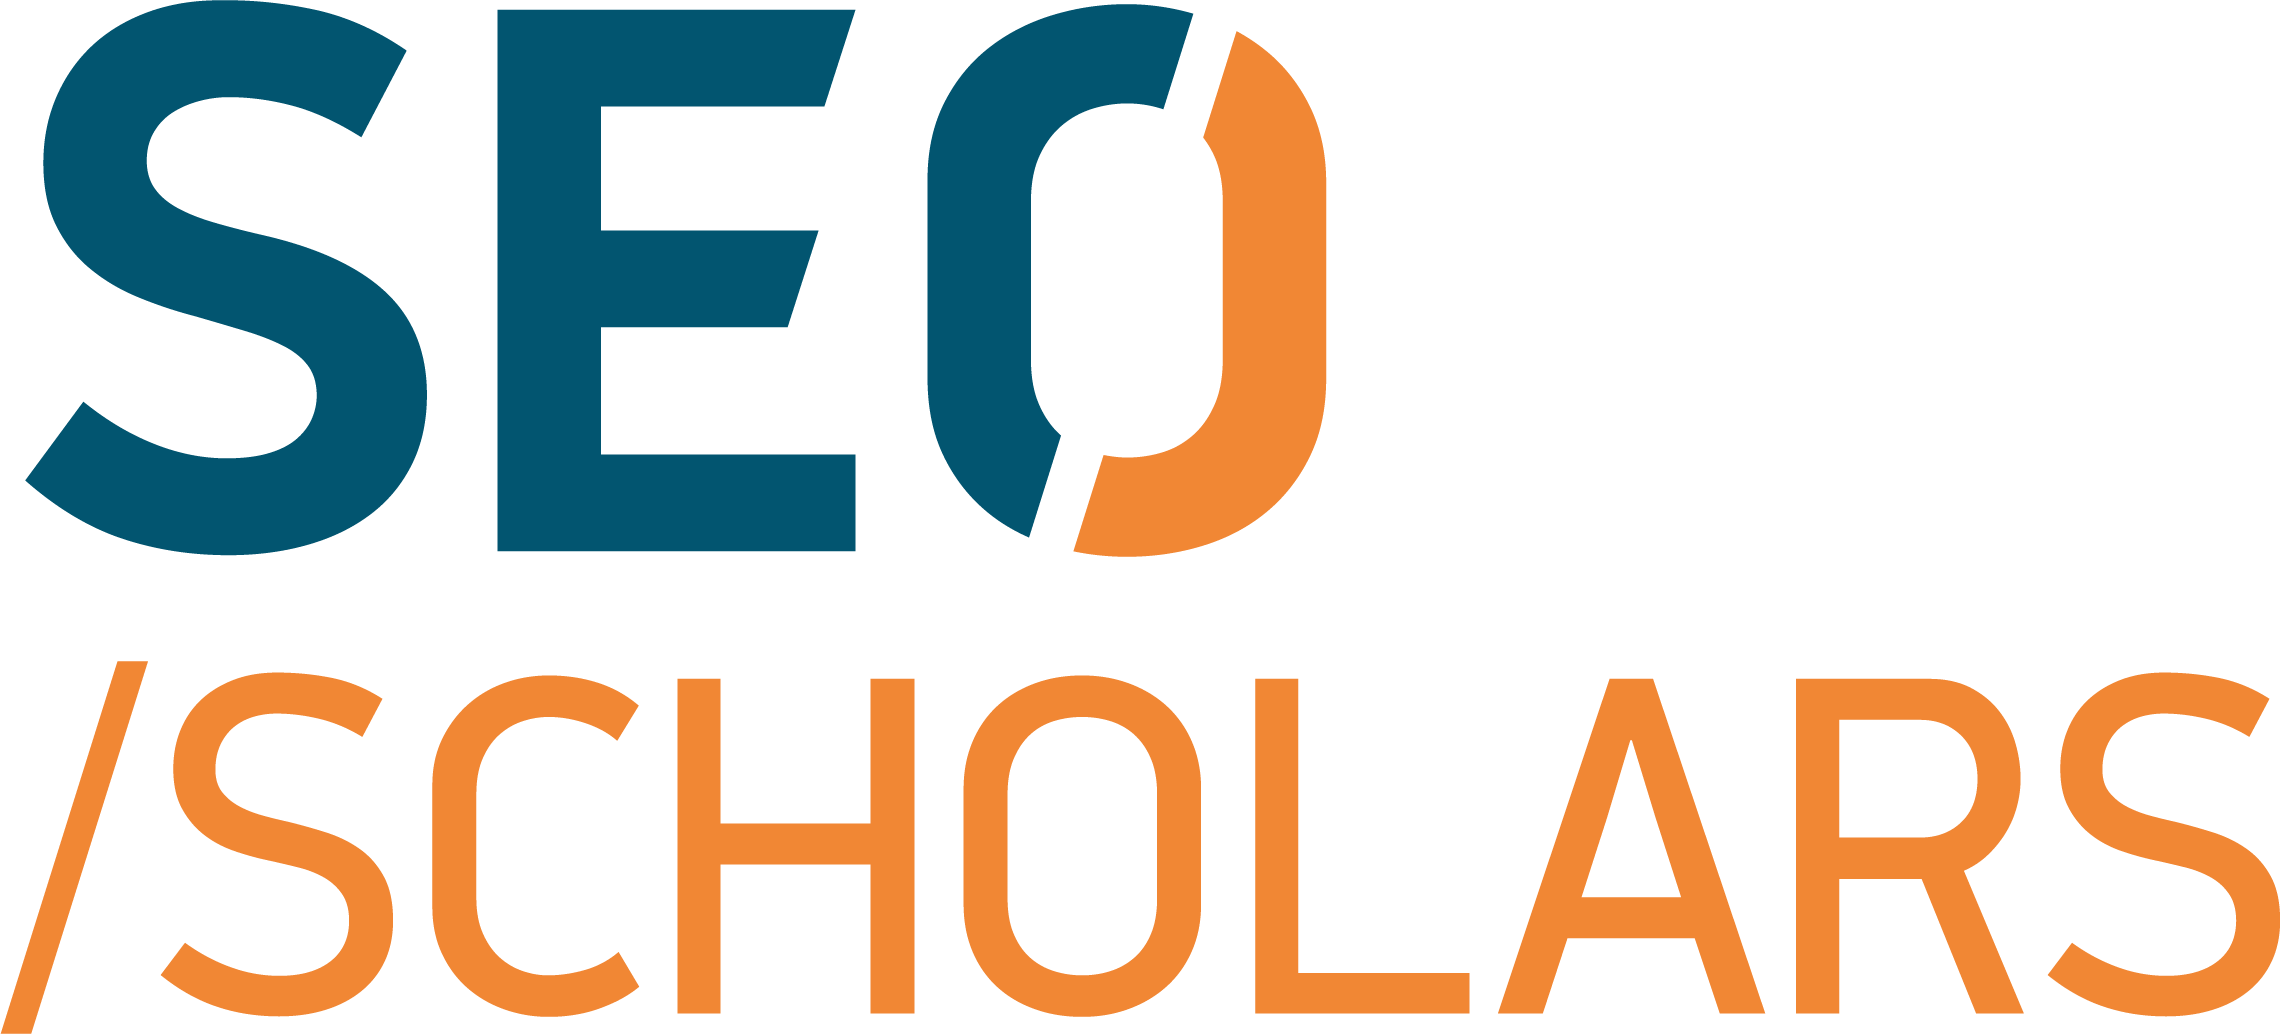 SEO Scholars logo image